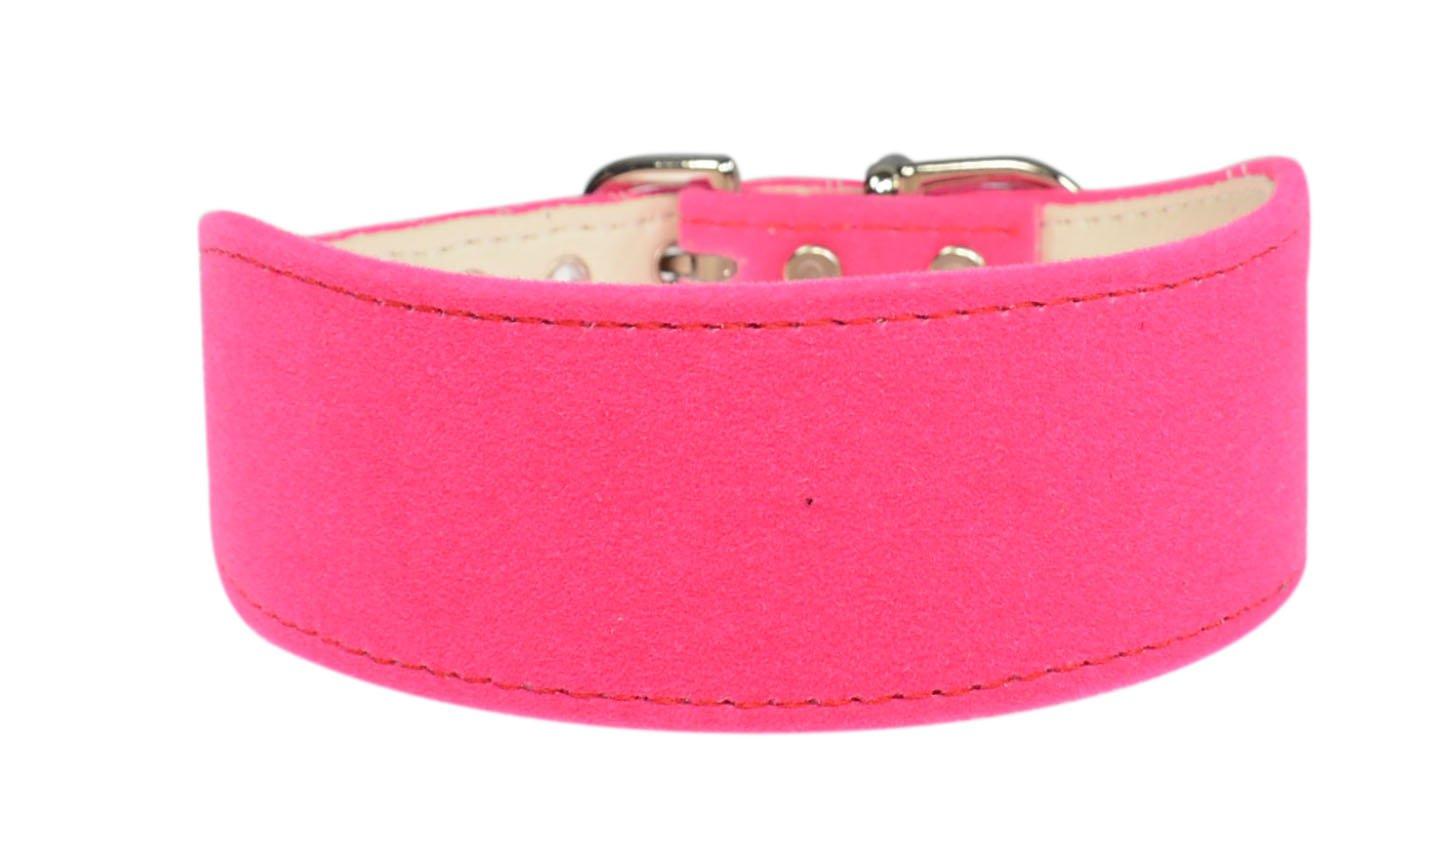 Evans Collars Shaped Collar, Size 16, Velvet, Pink